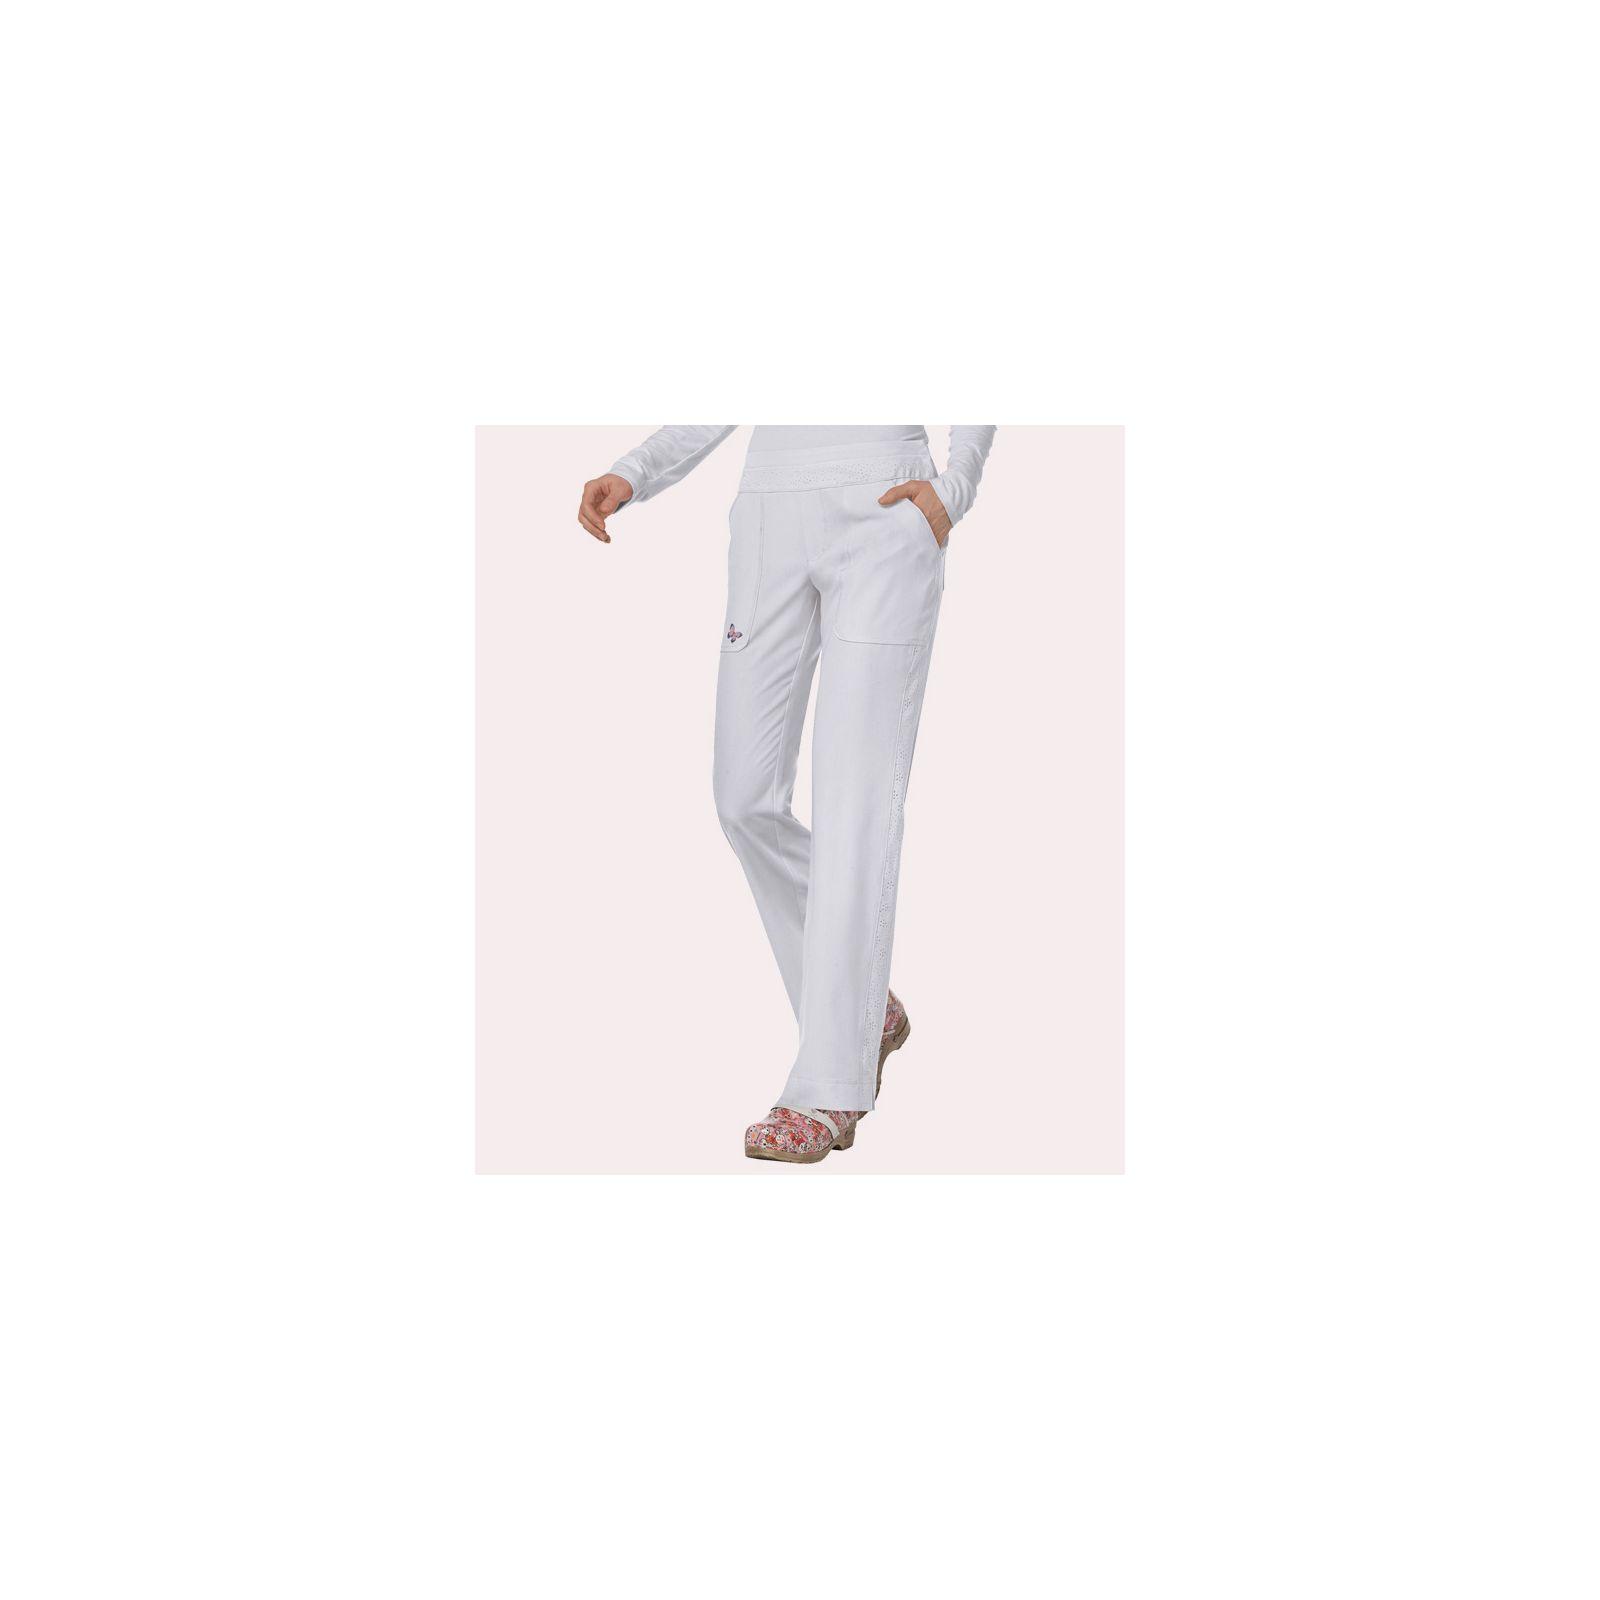 Pantalon Femme Blanc Koi (727) vue produit